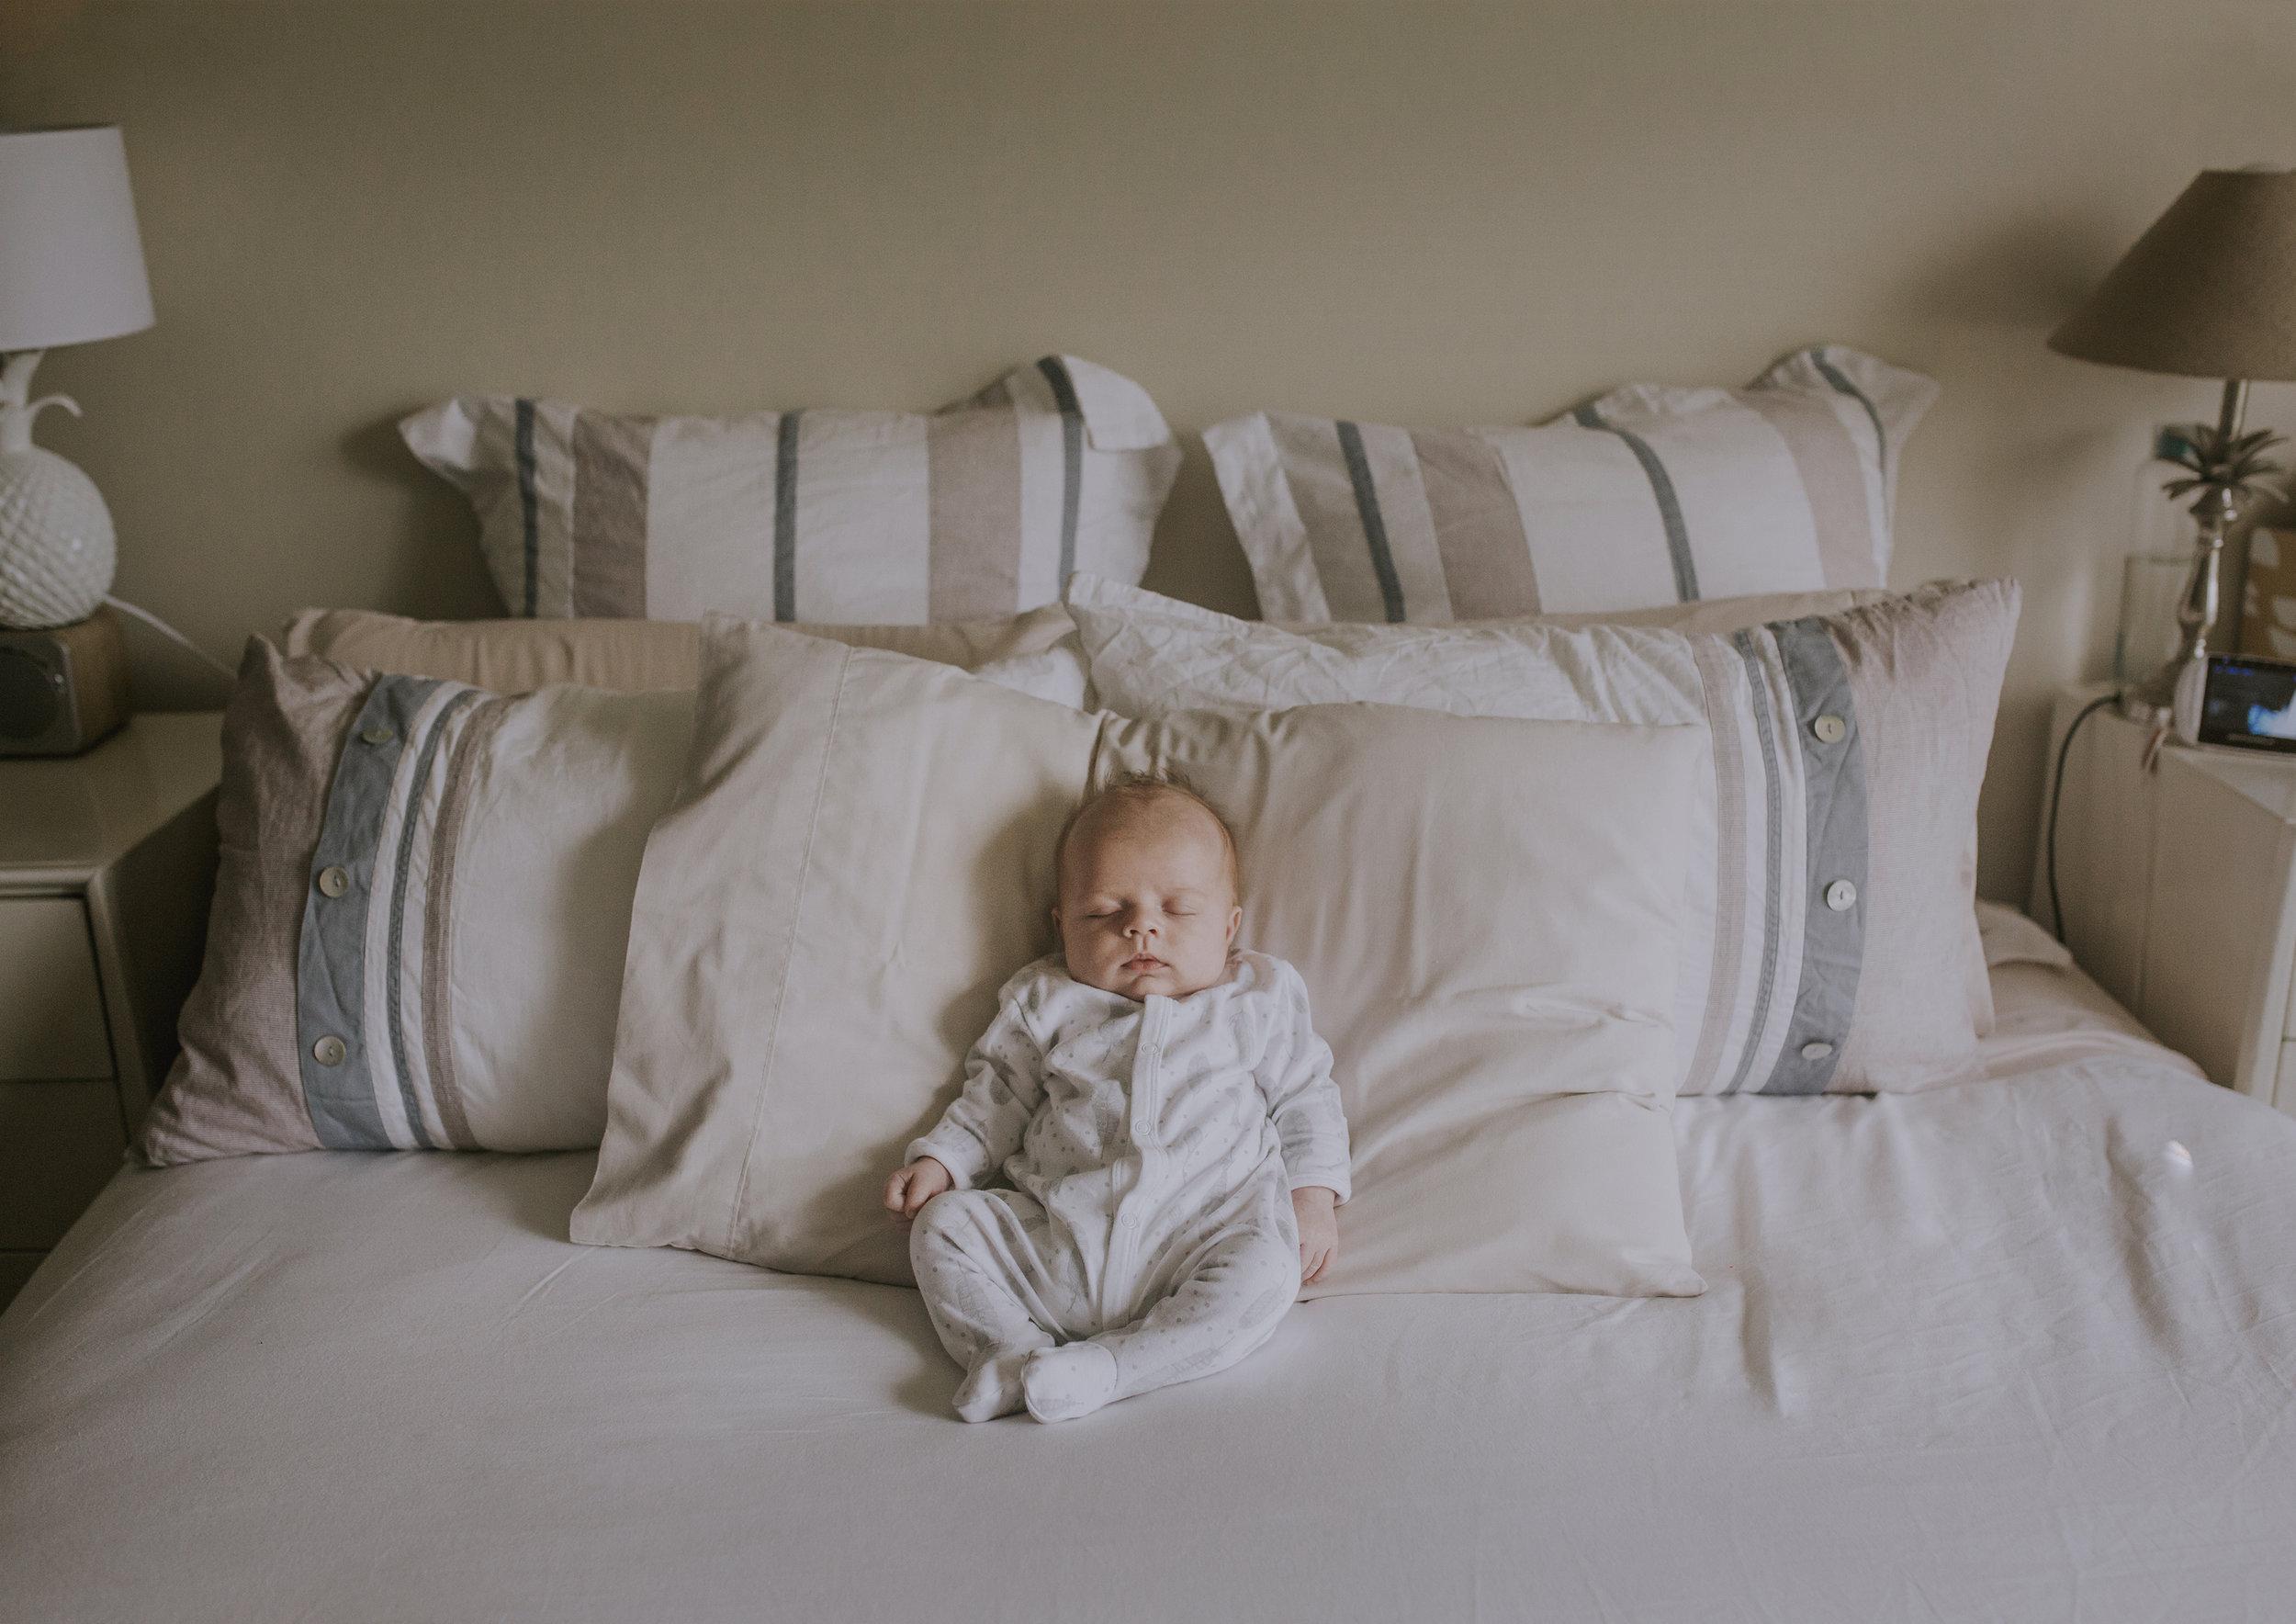 Newborn Baby Boy asleep on his parent's bed!